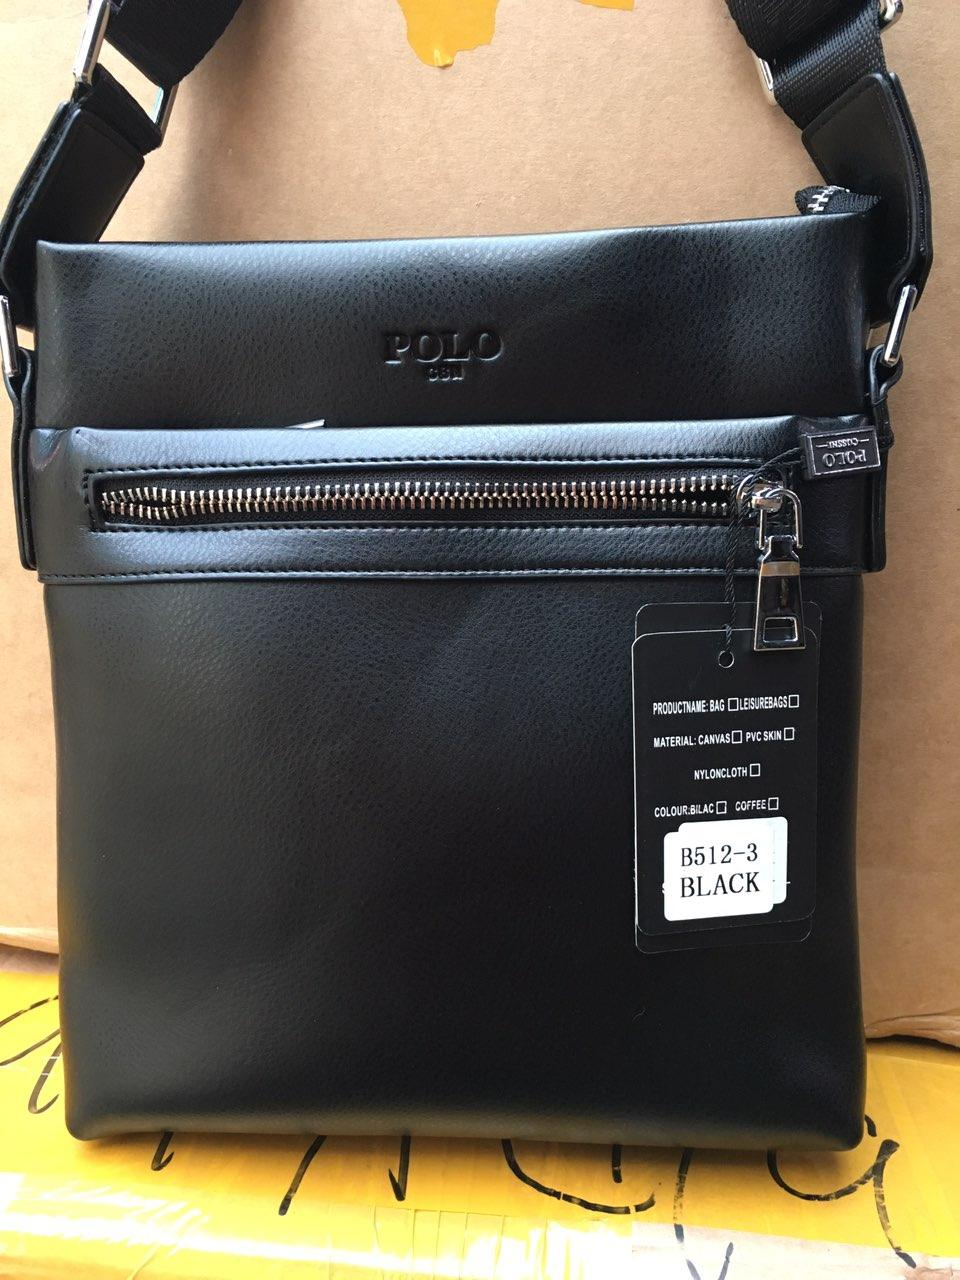 Мужская сумка через плечо от фирмы Polo без клапана опт/розница